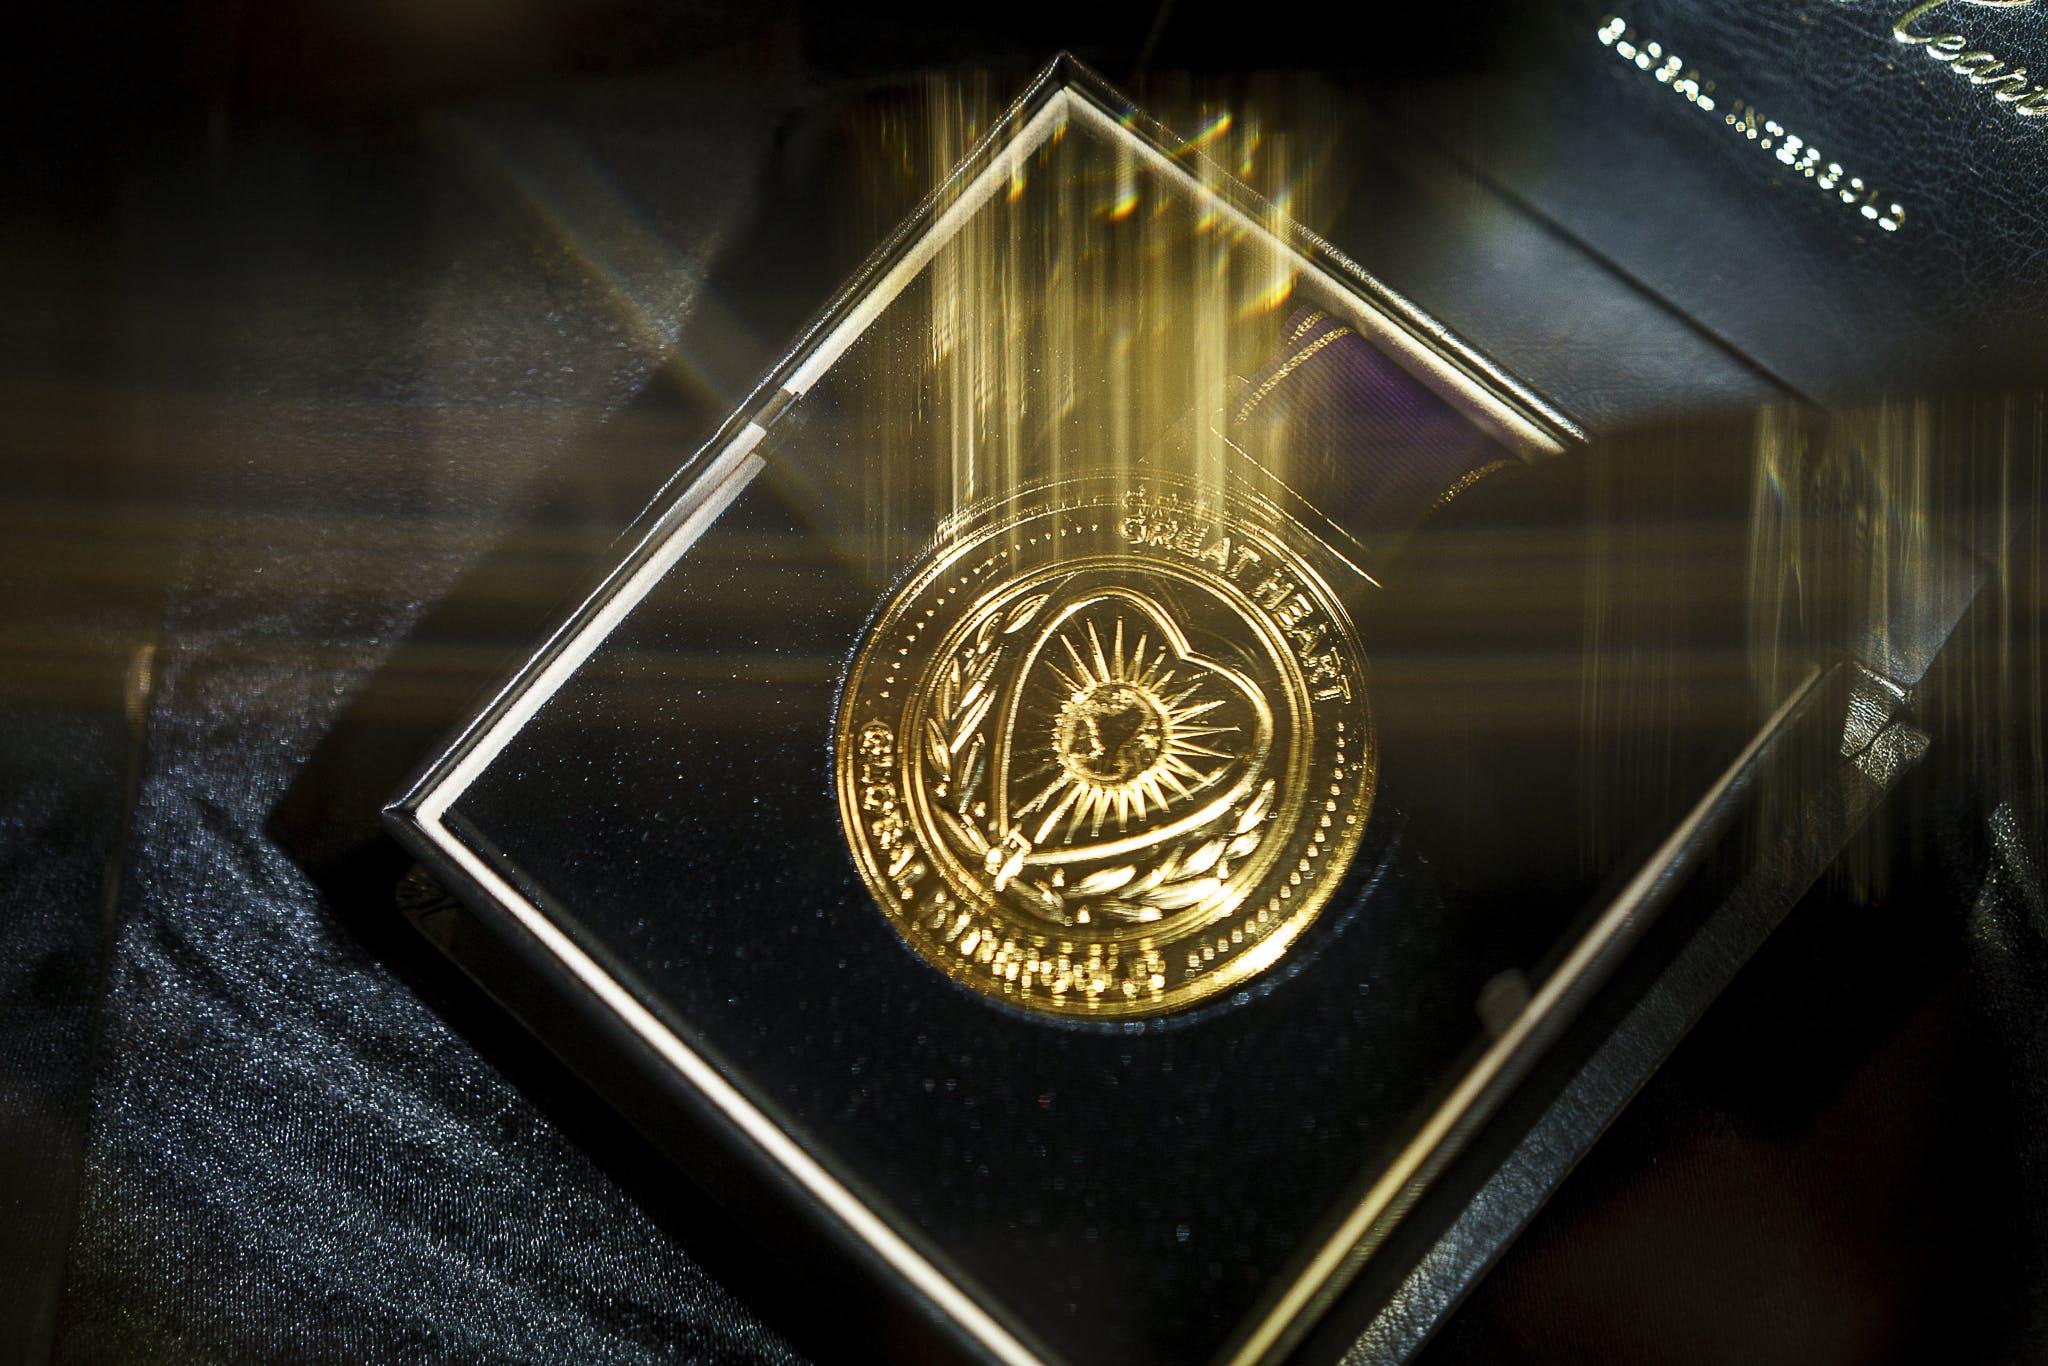 Free stock photo of Aristippus, fractal, gold, gold bars